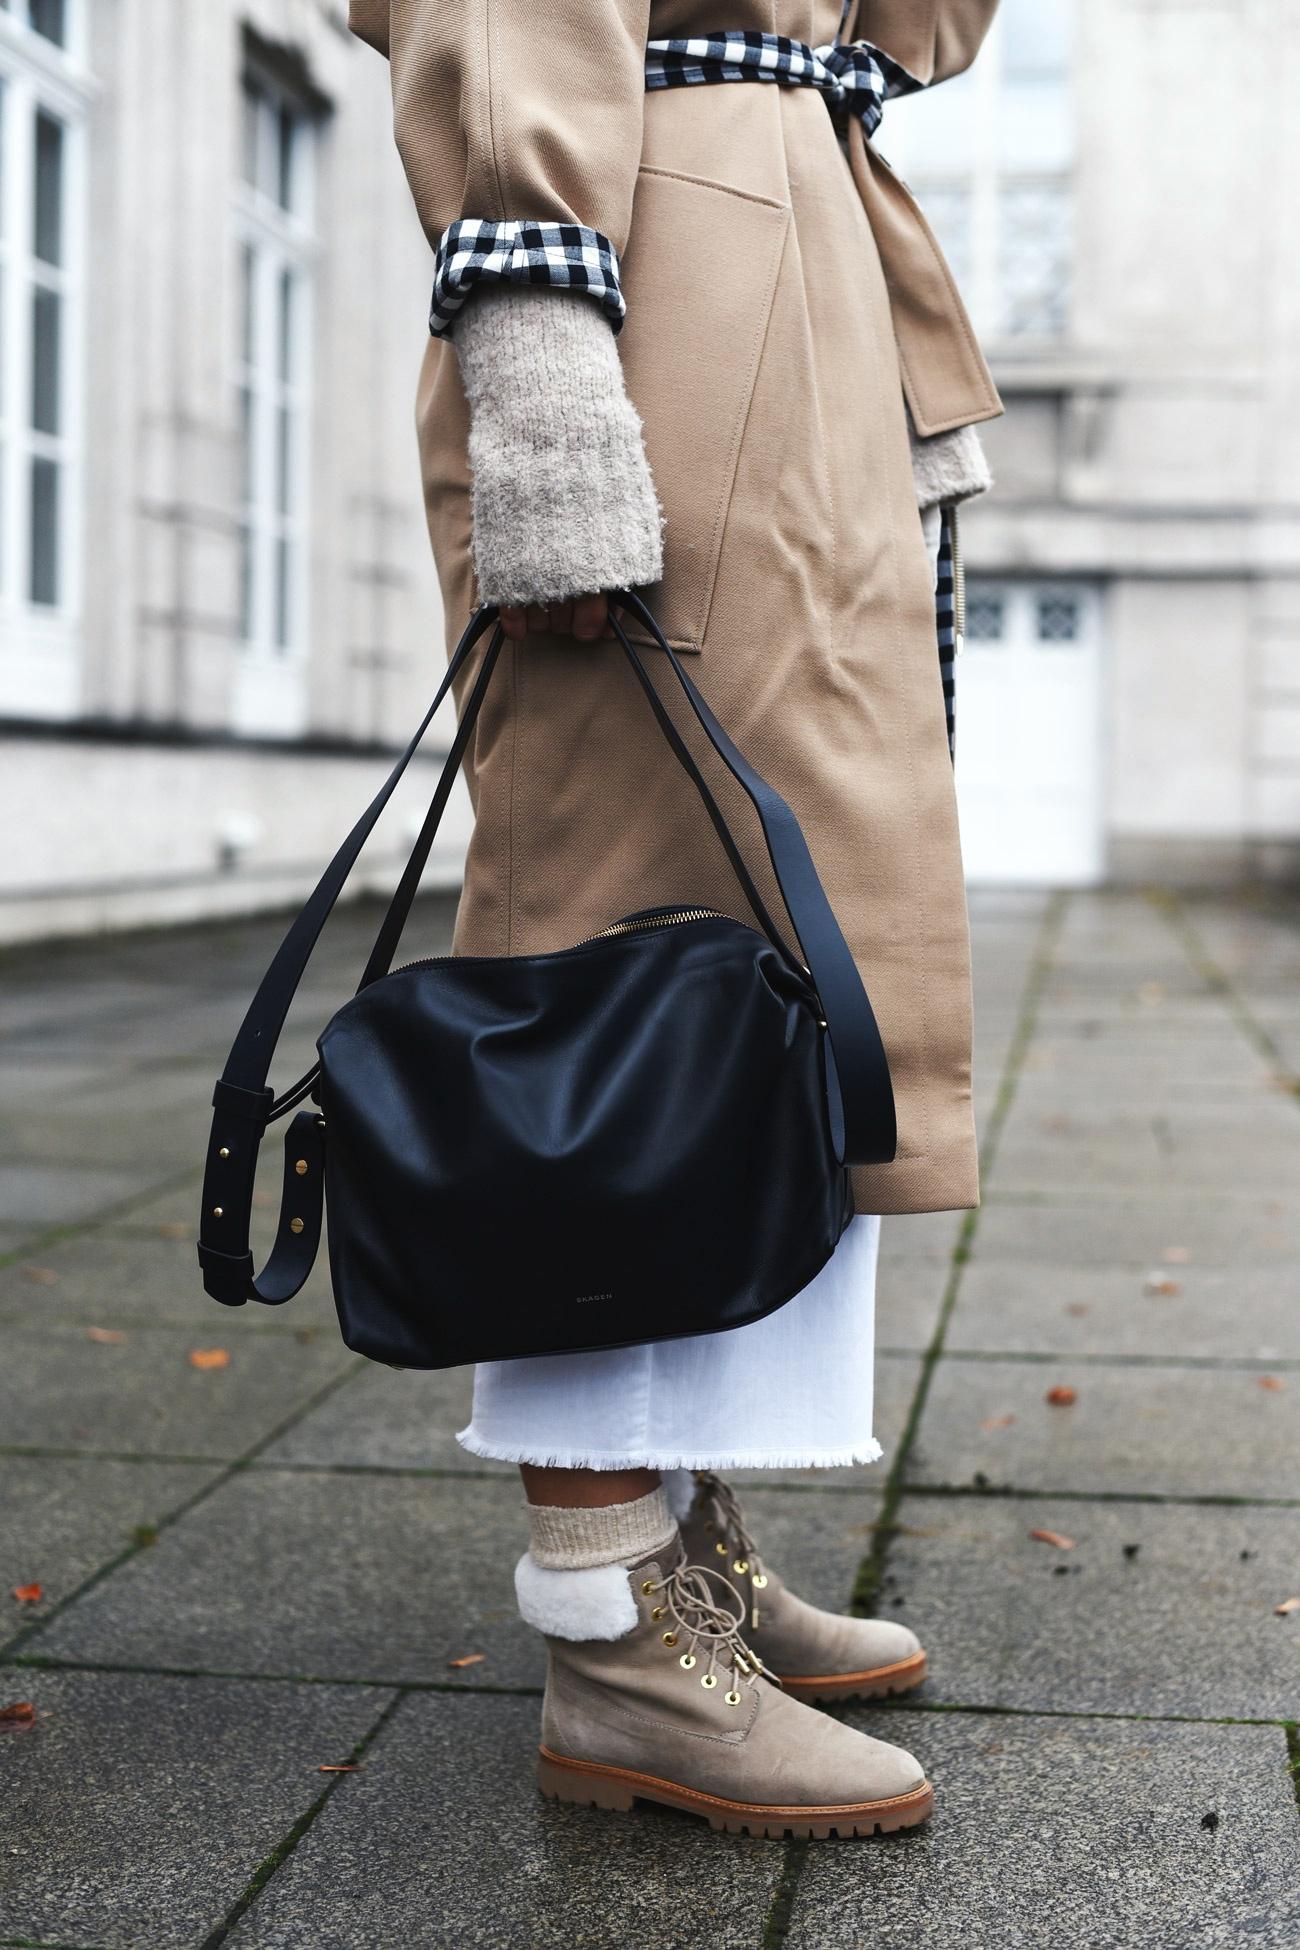 aquazzura-heilbrunner-boots-beige-mit-fell-wanderstiefel-schuh-trend-2016-fashiioncarpet